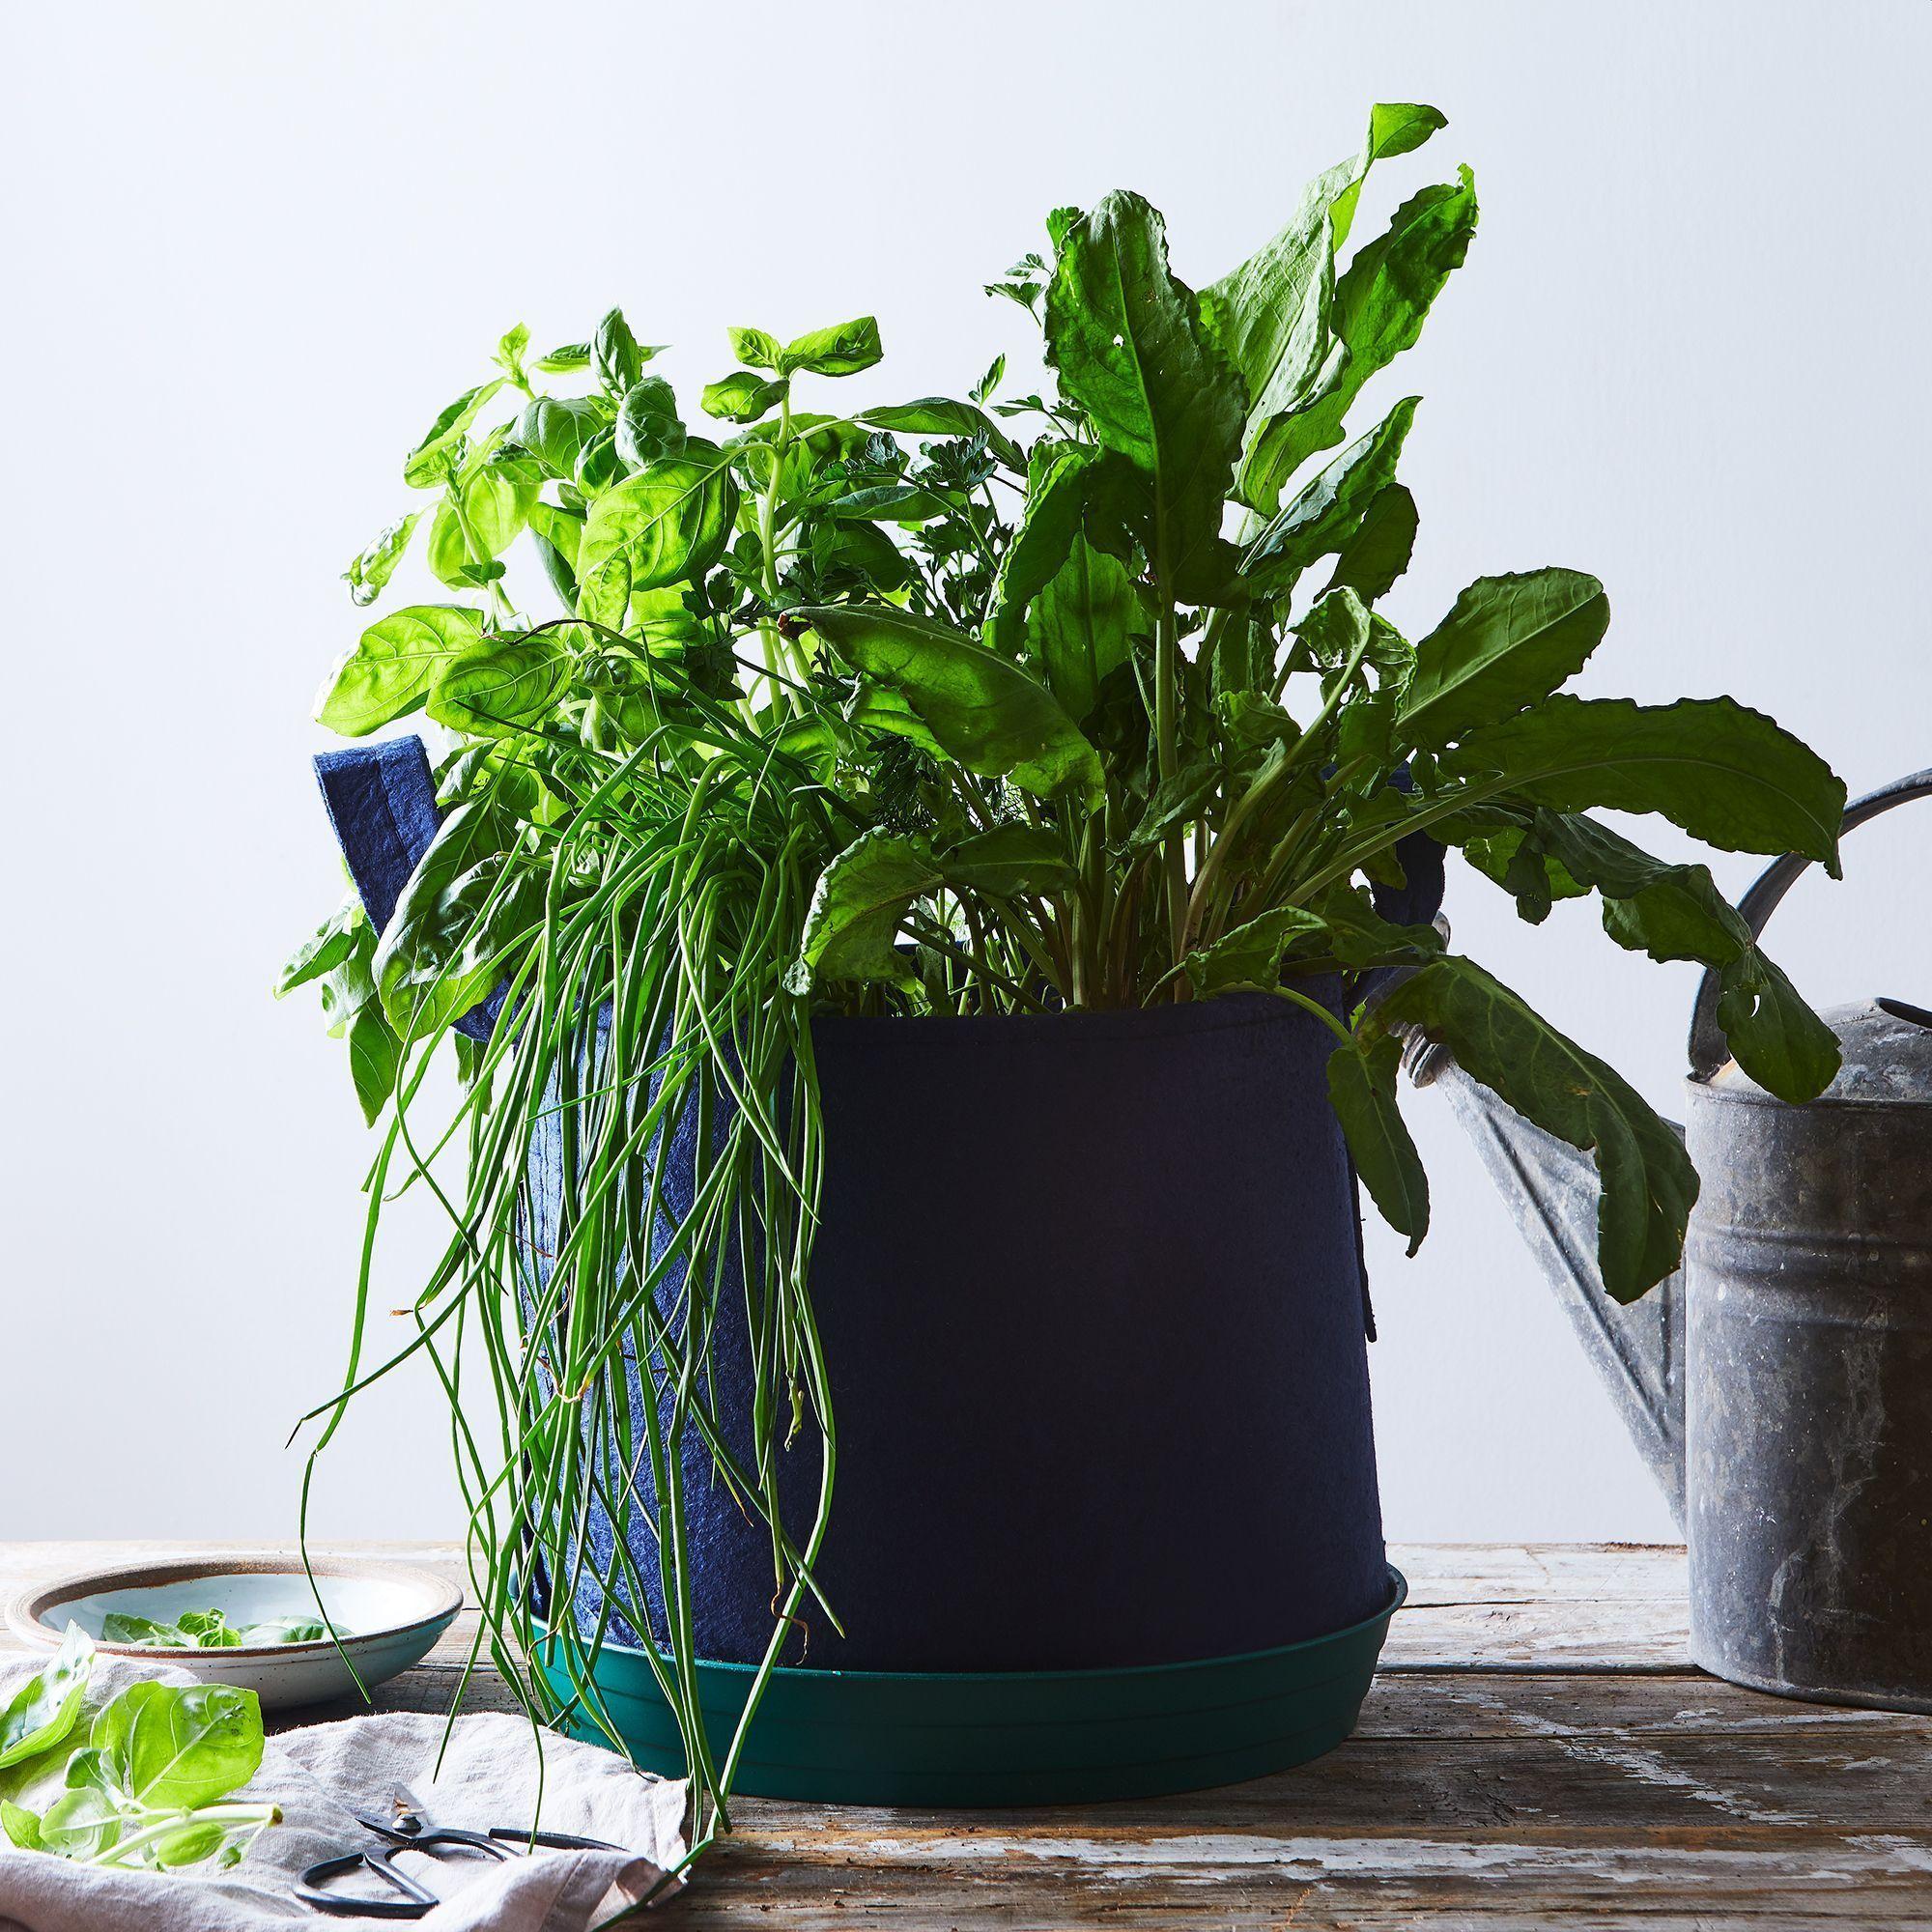 Seedsheet Grow-Your-Own Container Garden #gardeningidea